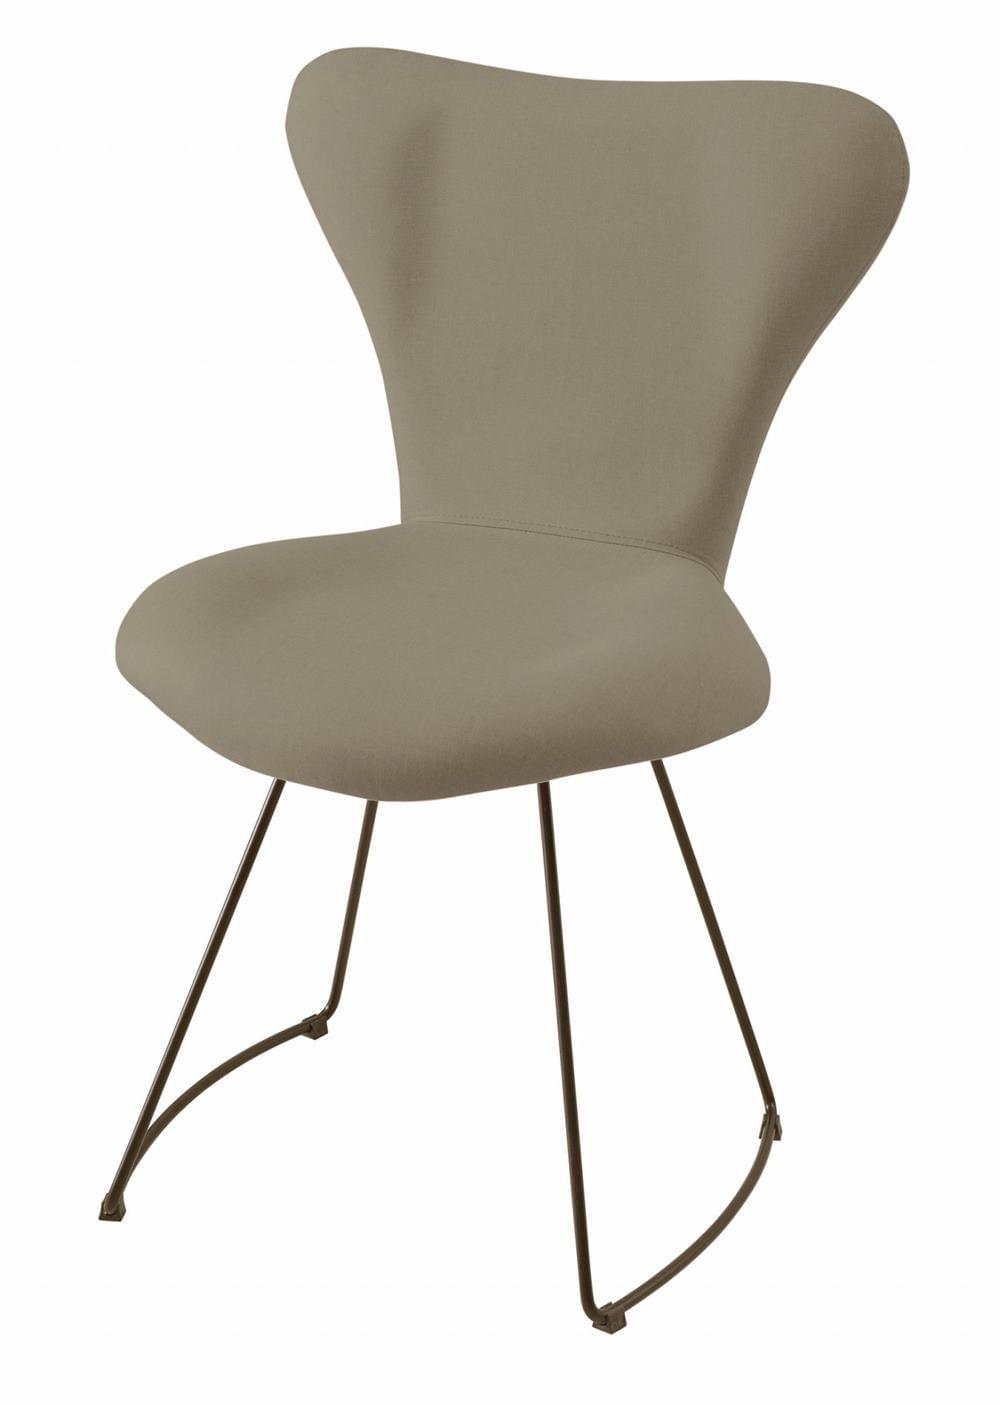 Cadeira Jacobsen Series 7 Cinza com Base Curve Preta - 49611